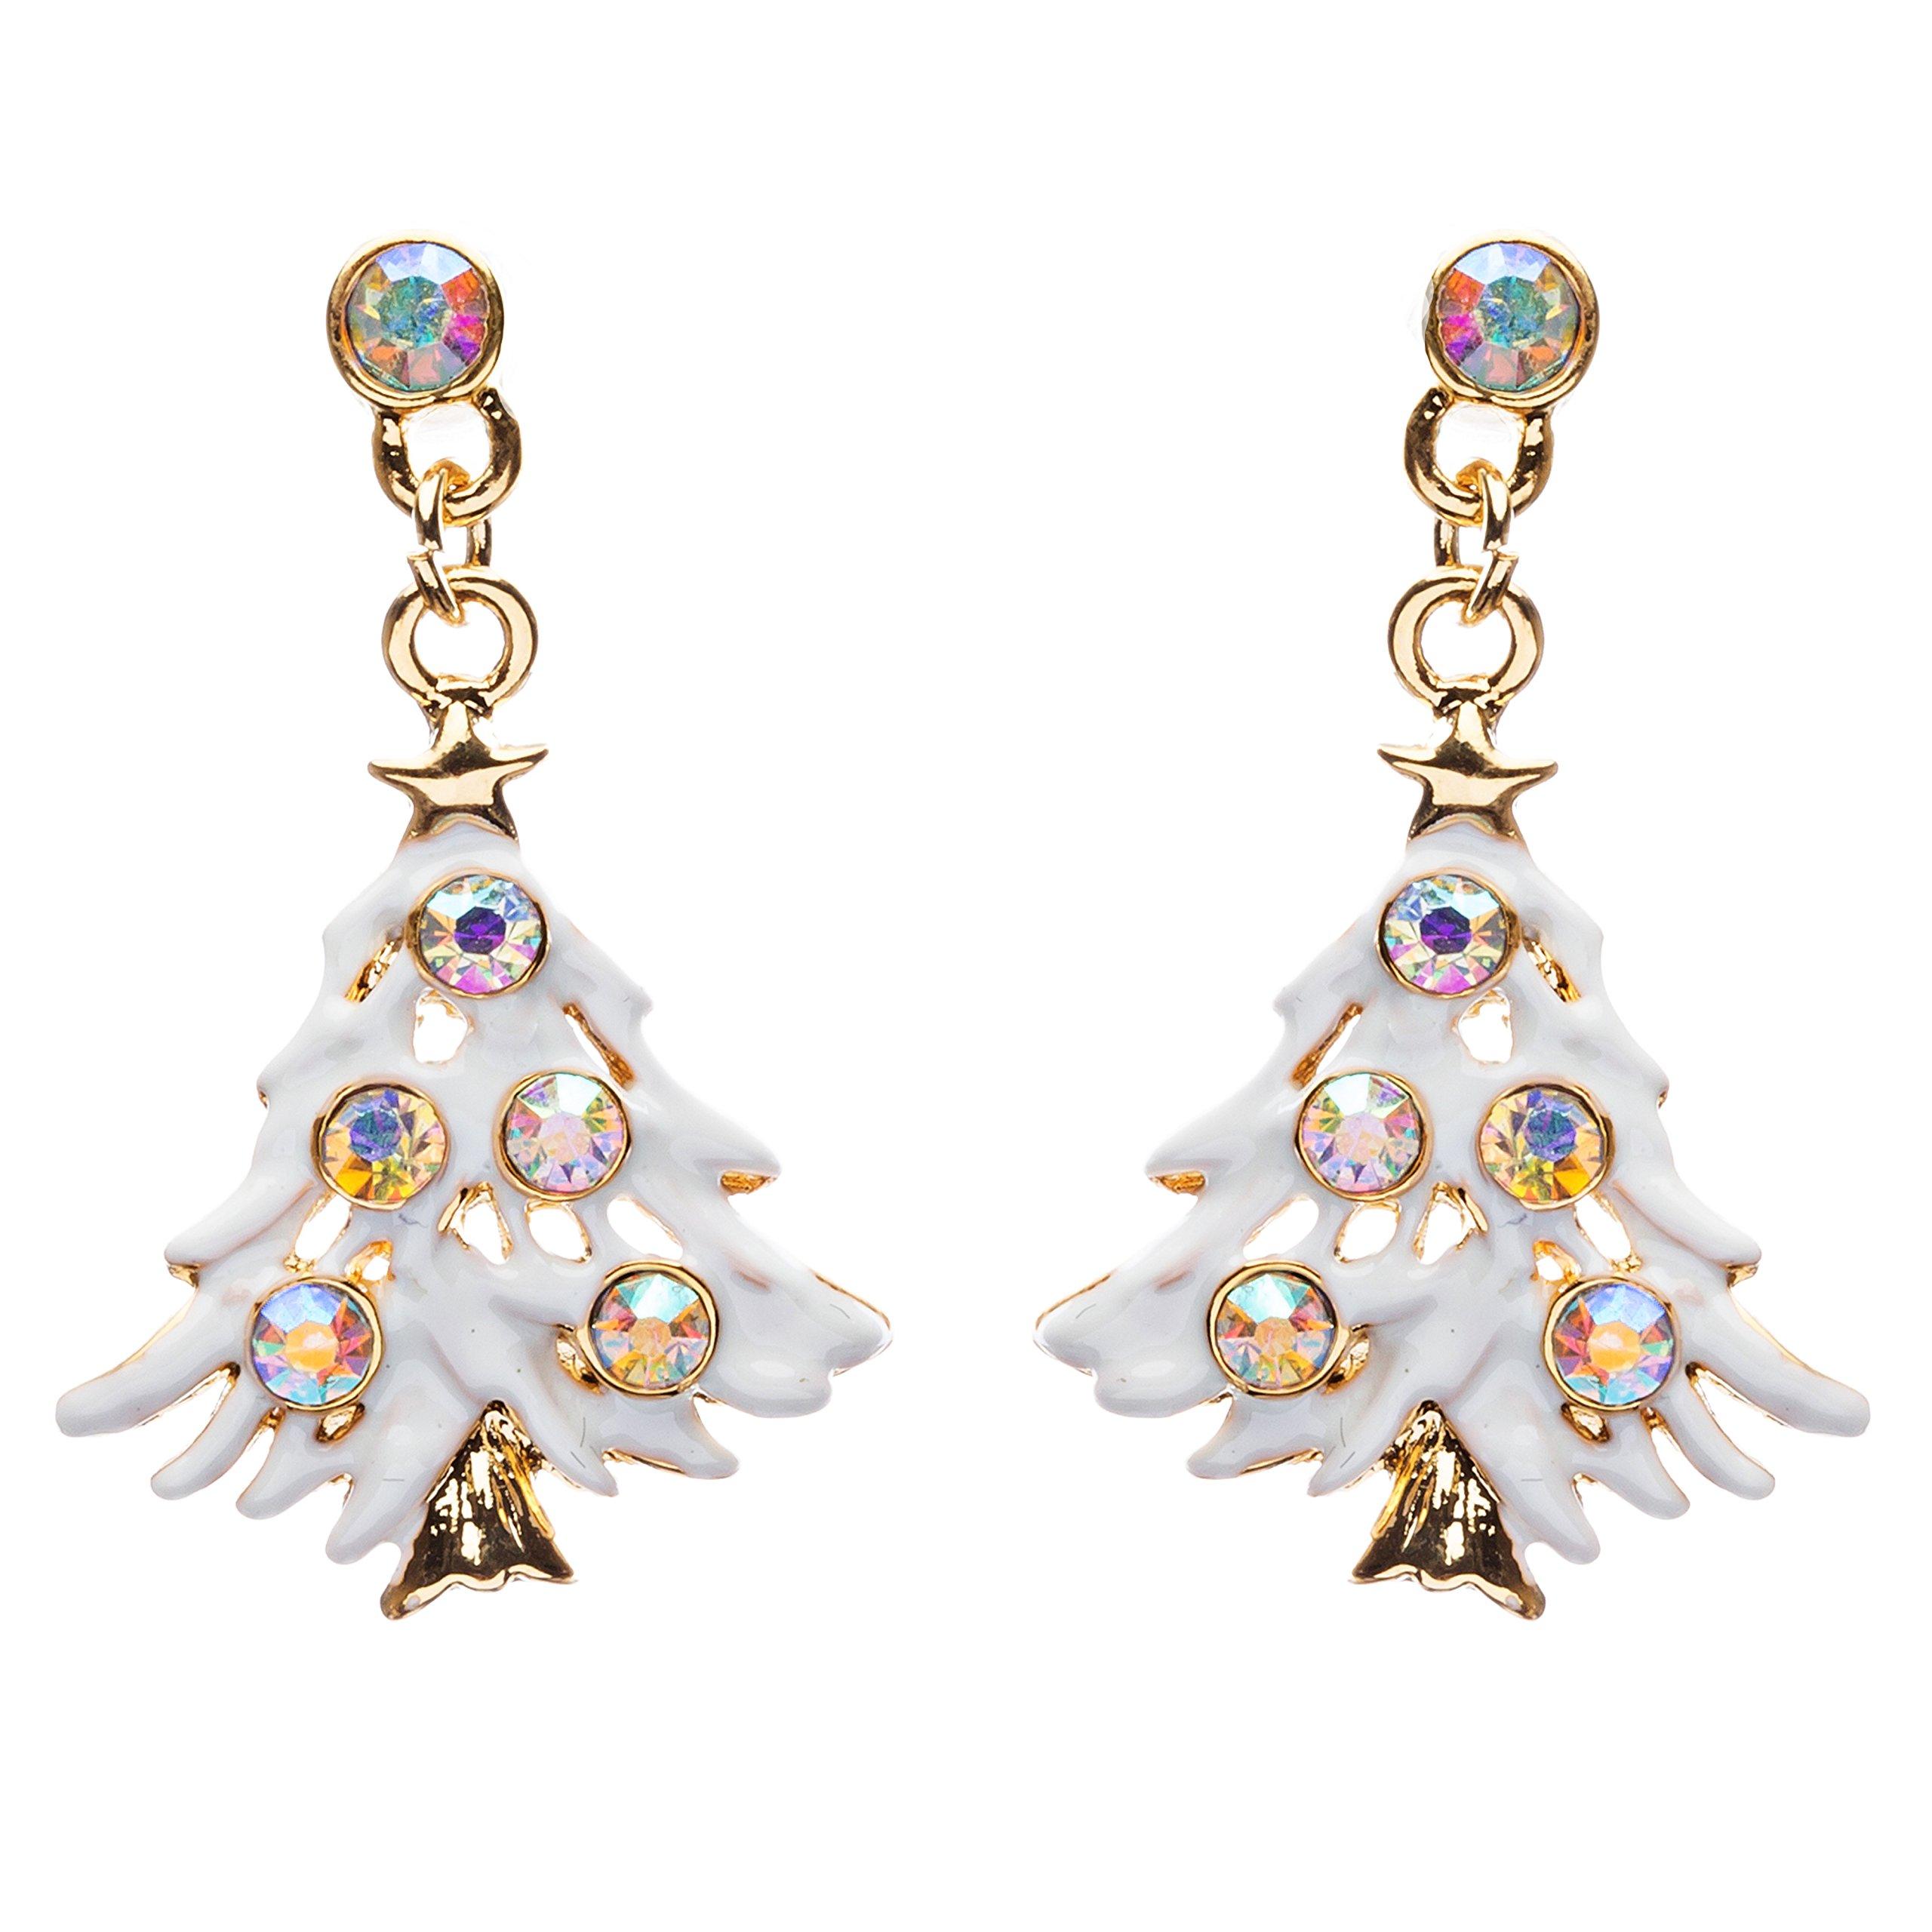 ACCESSORIESFOREVER Women Christmas Jewelry Crystal Rhinestone Colorful Christmas Tree Earrings E799 Multi